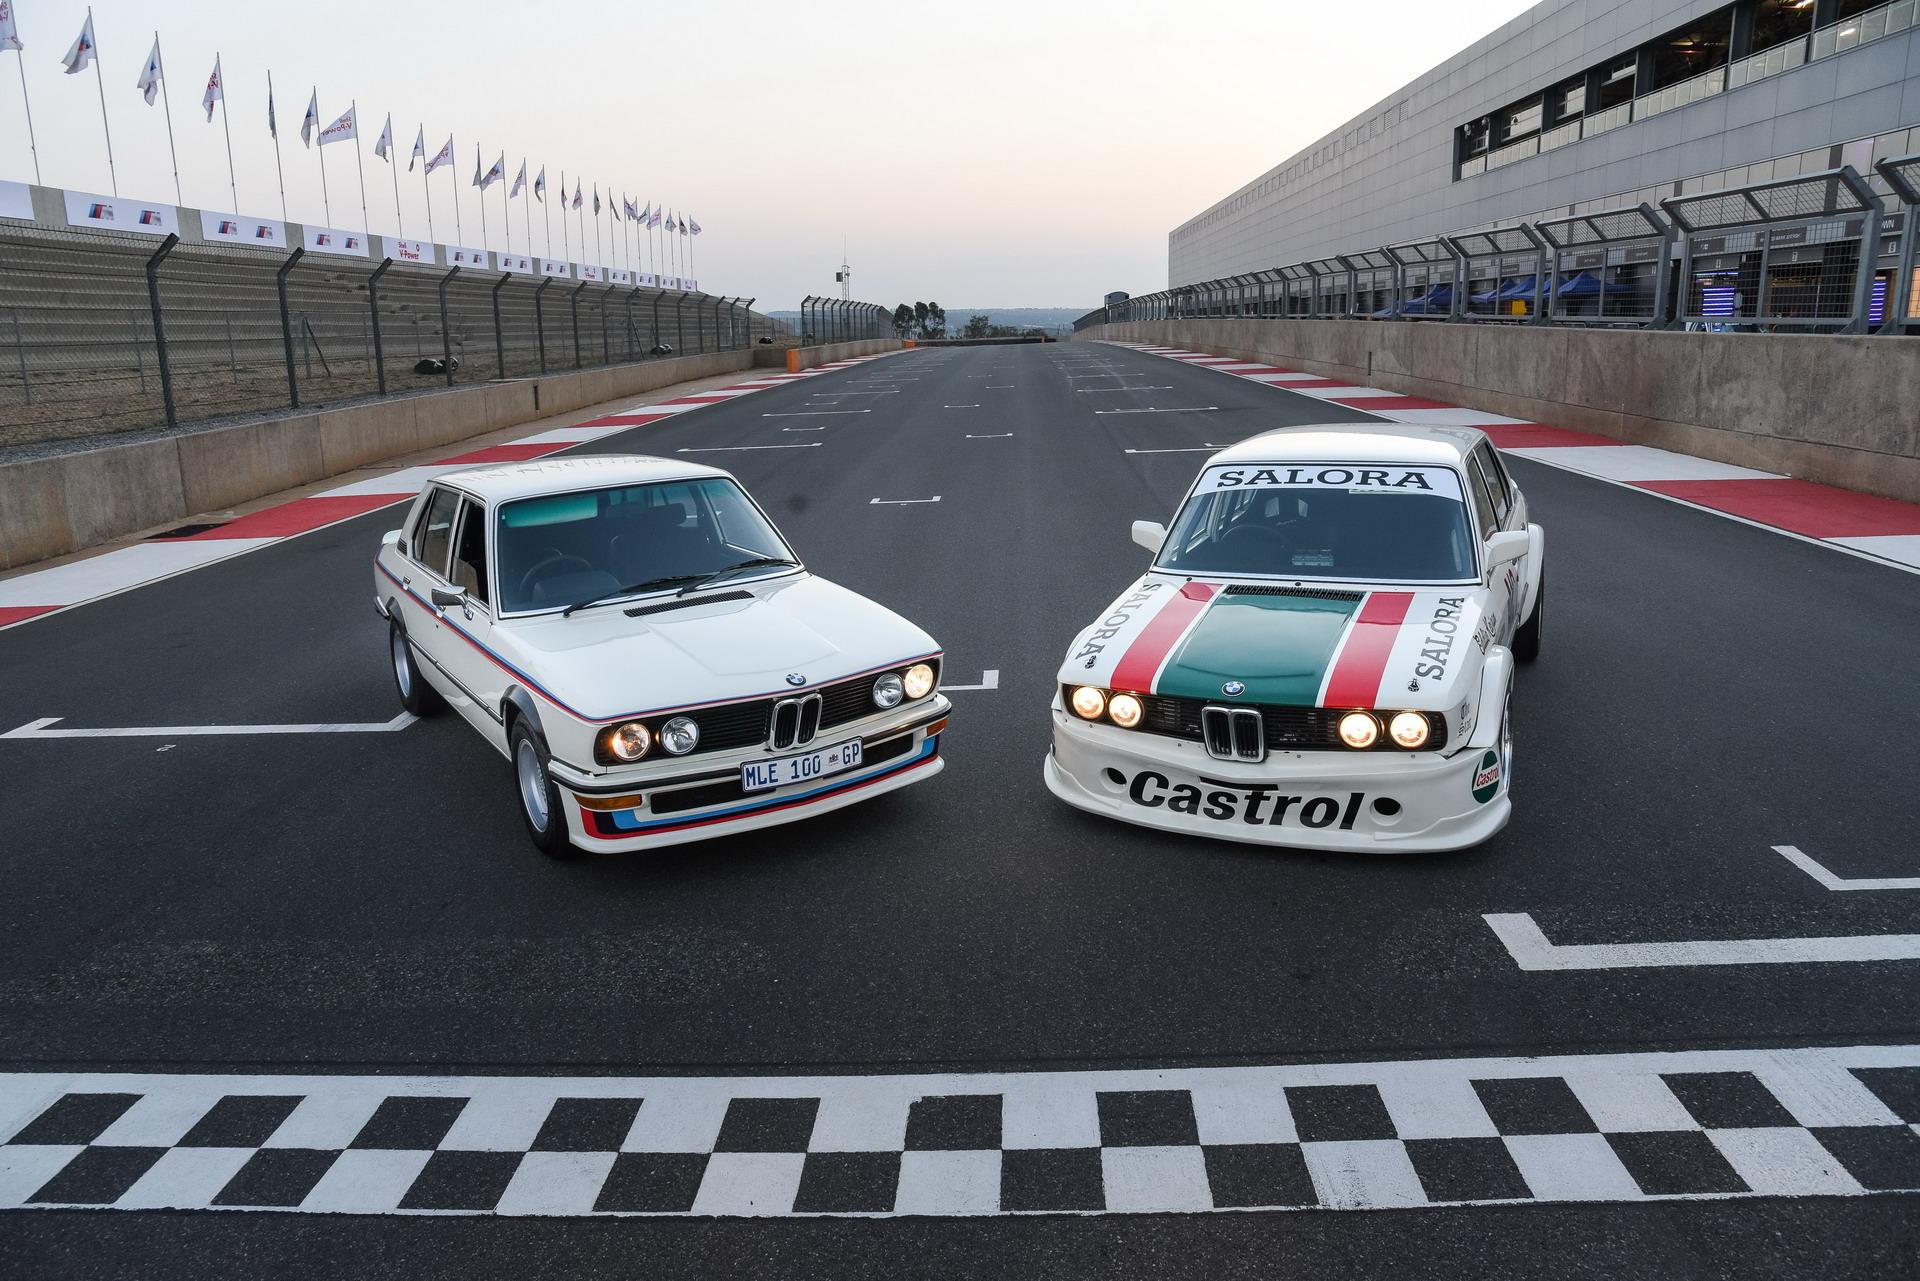 The racing BMW 530 MLE 21